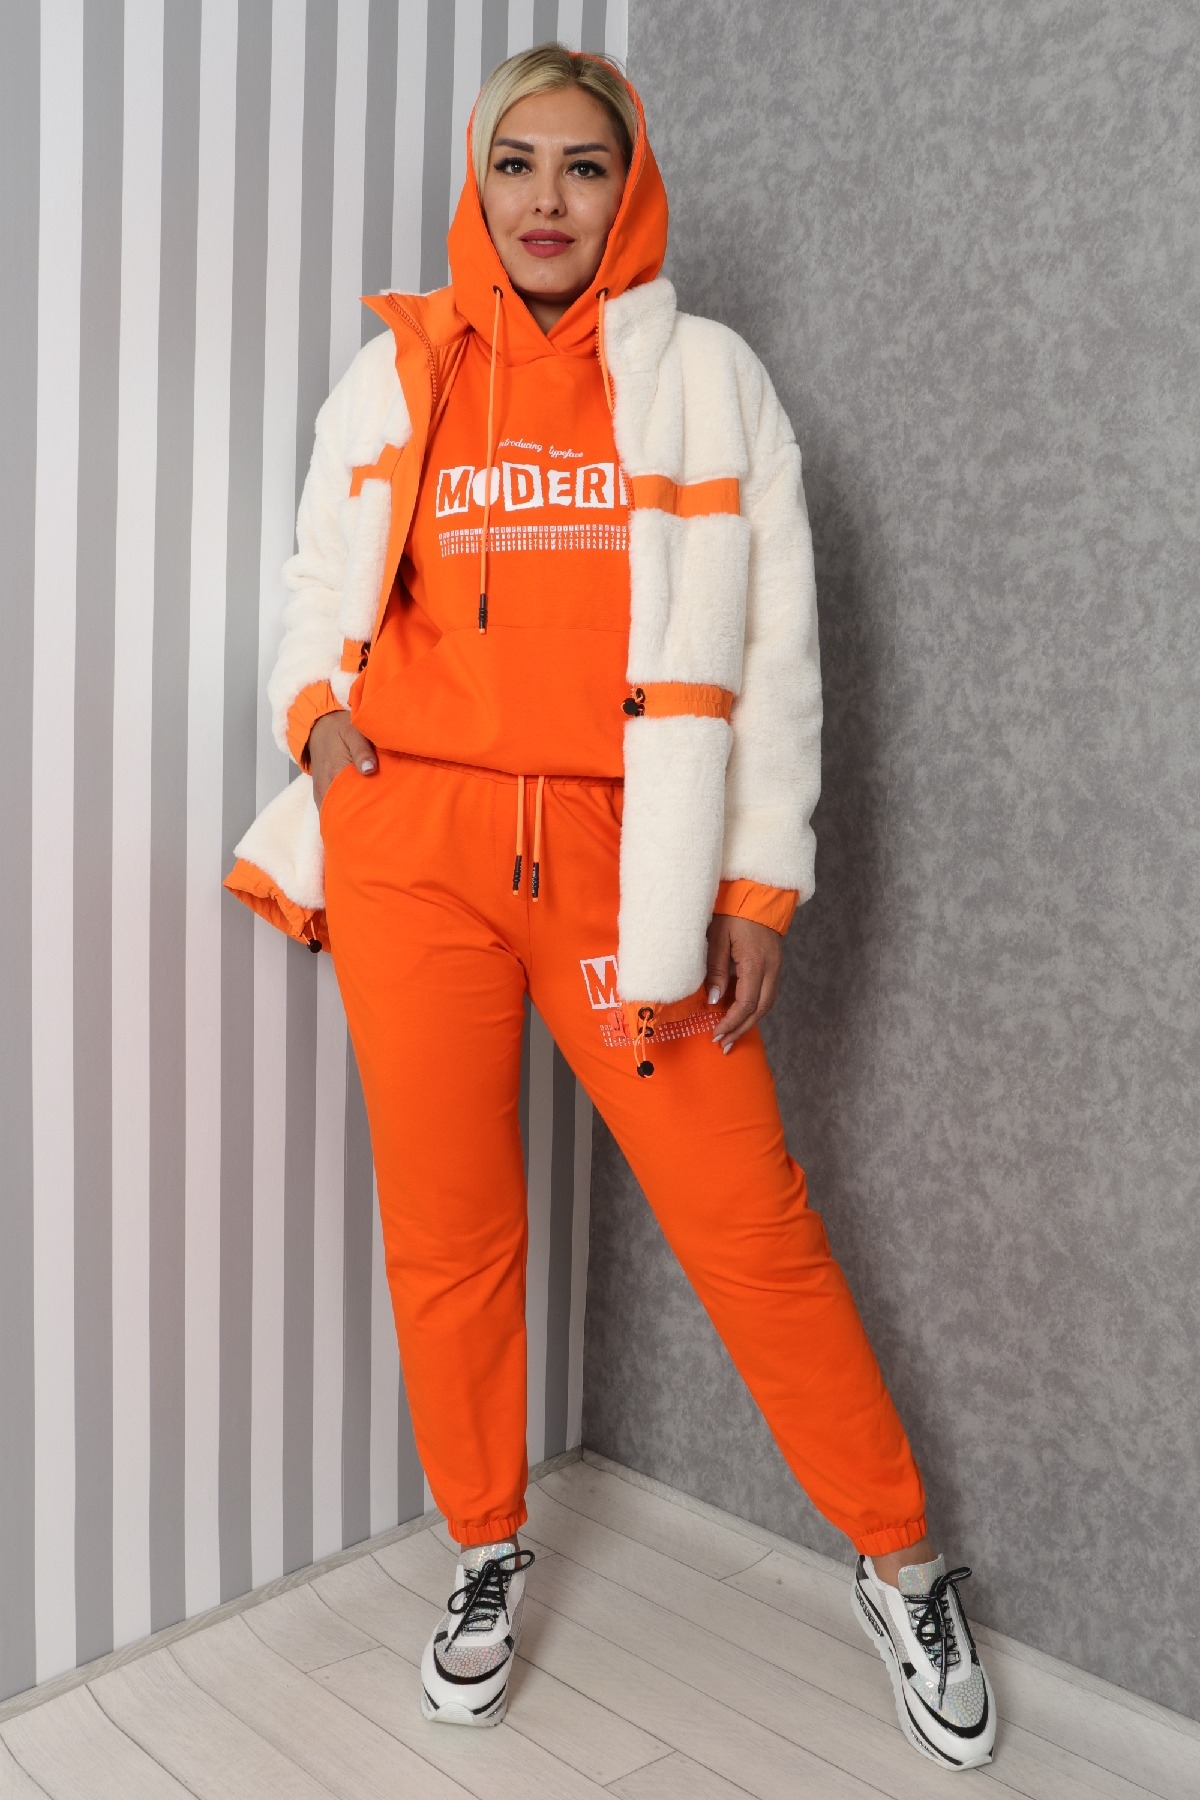 Women's 3 Piece Suits-Orange